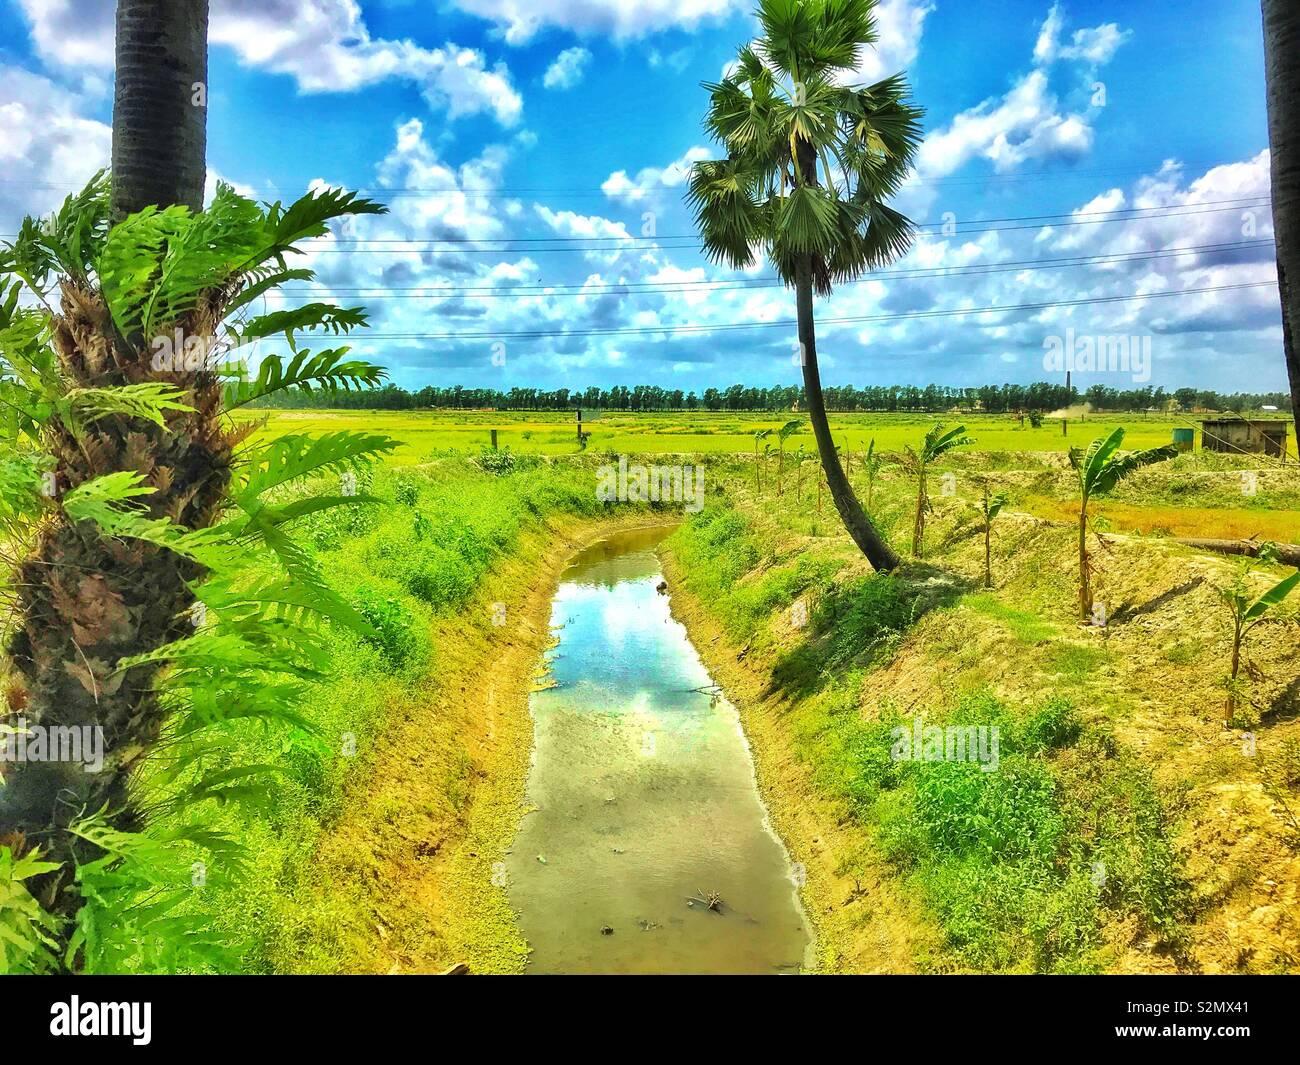 Natural Beauty of Bangladesh Stock Photo: 311475473 - Alamy